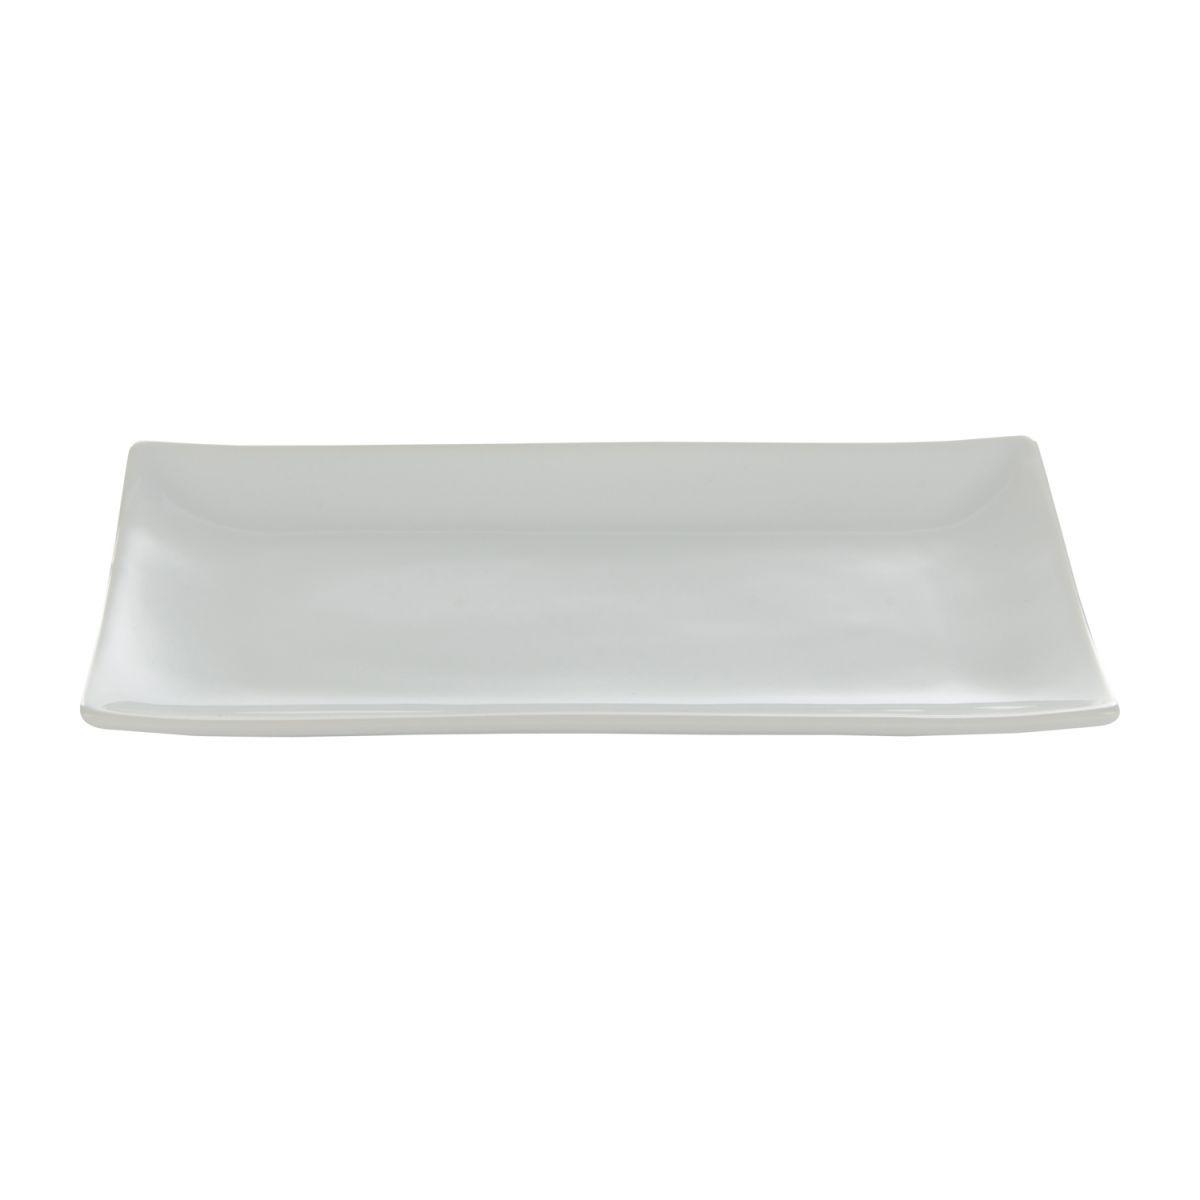 bord porselein wit rechthoekig 28x15cmbox 6